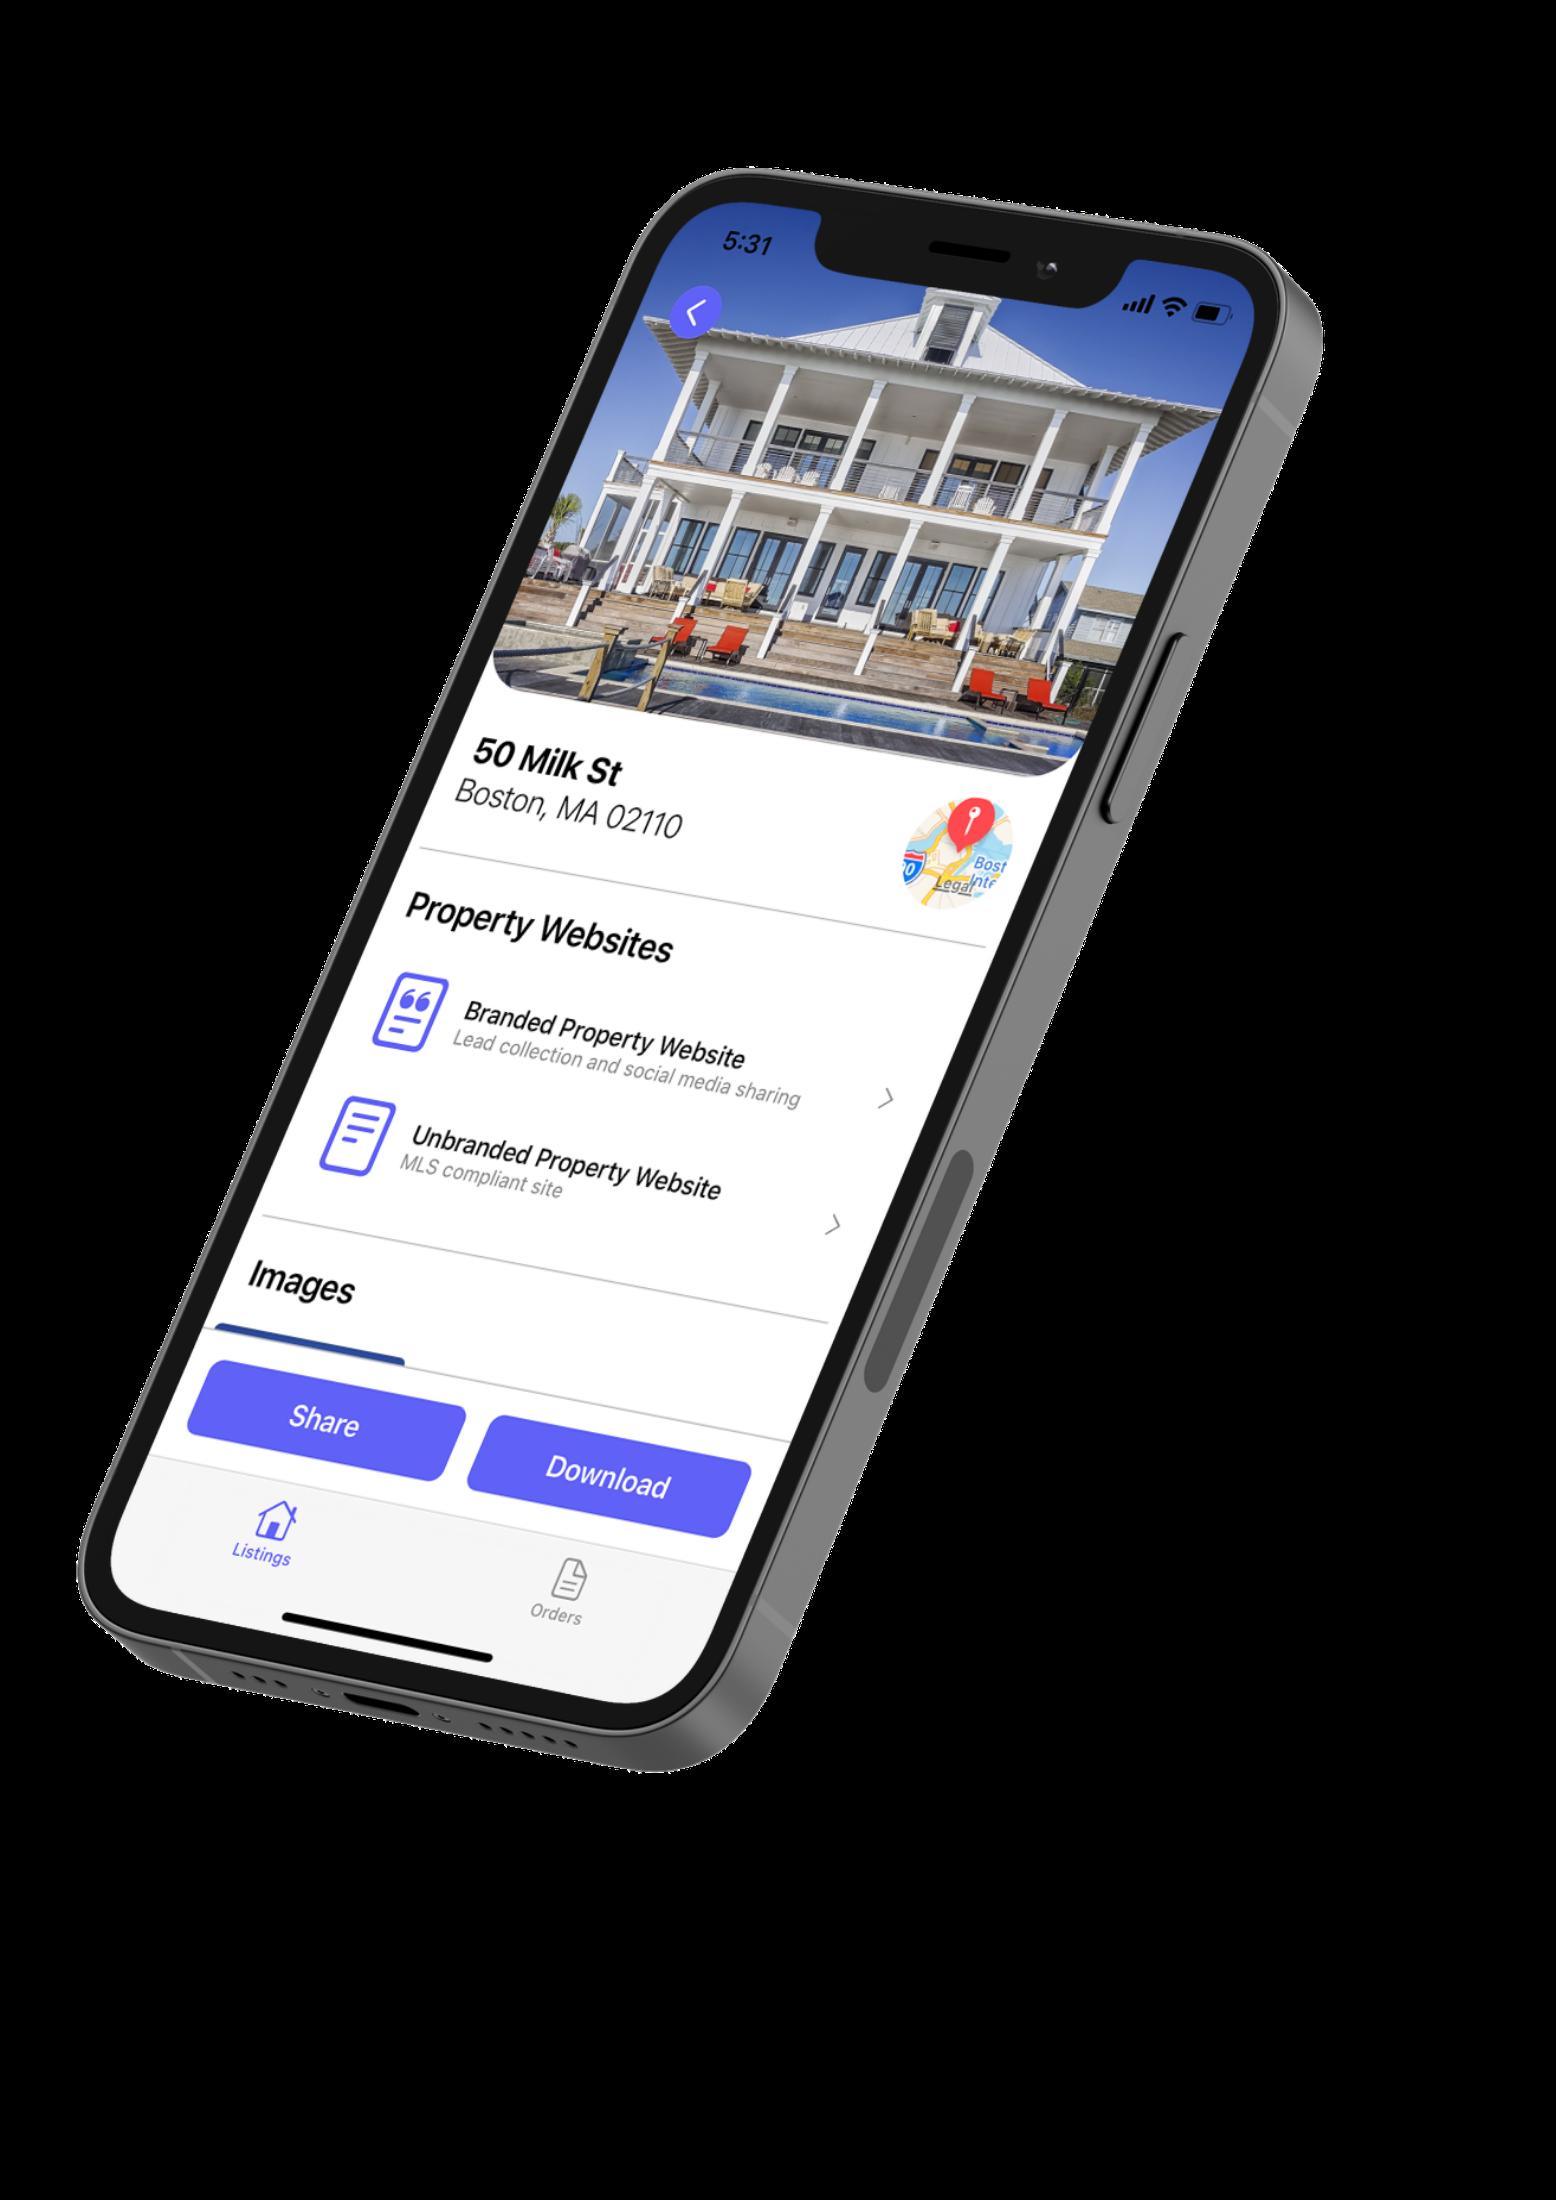 Aryeo mobile iOS listings app.